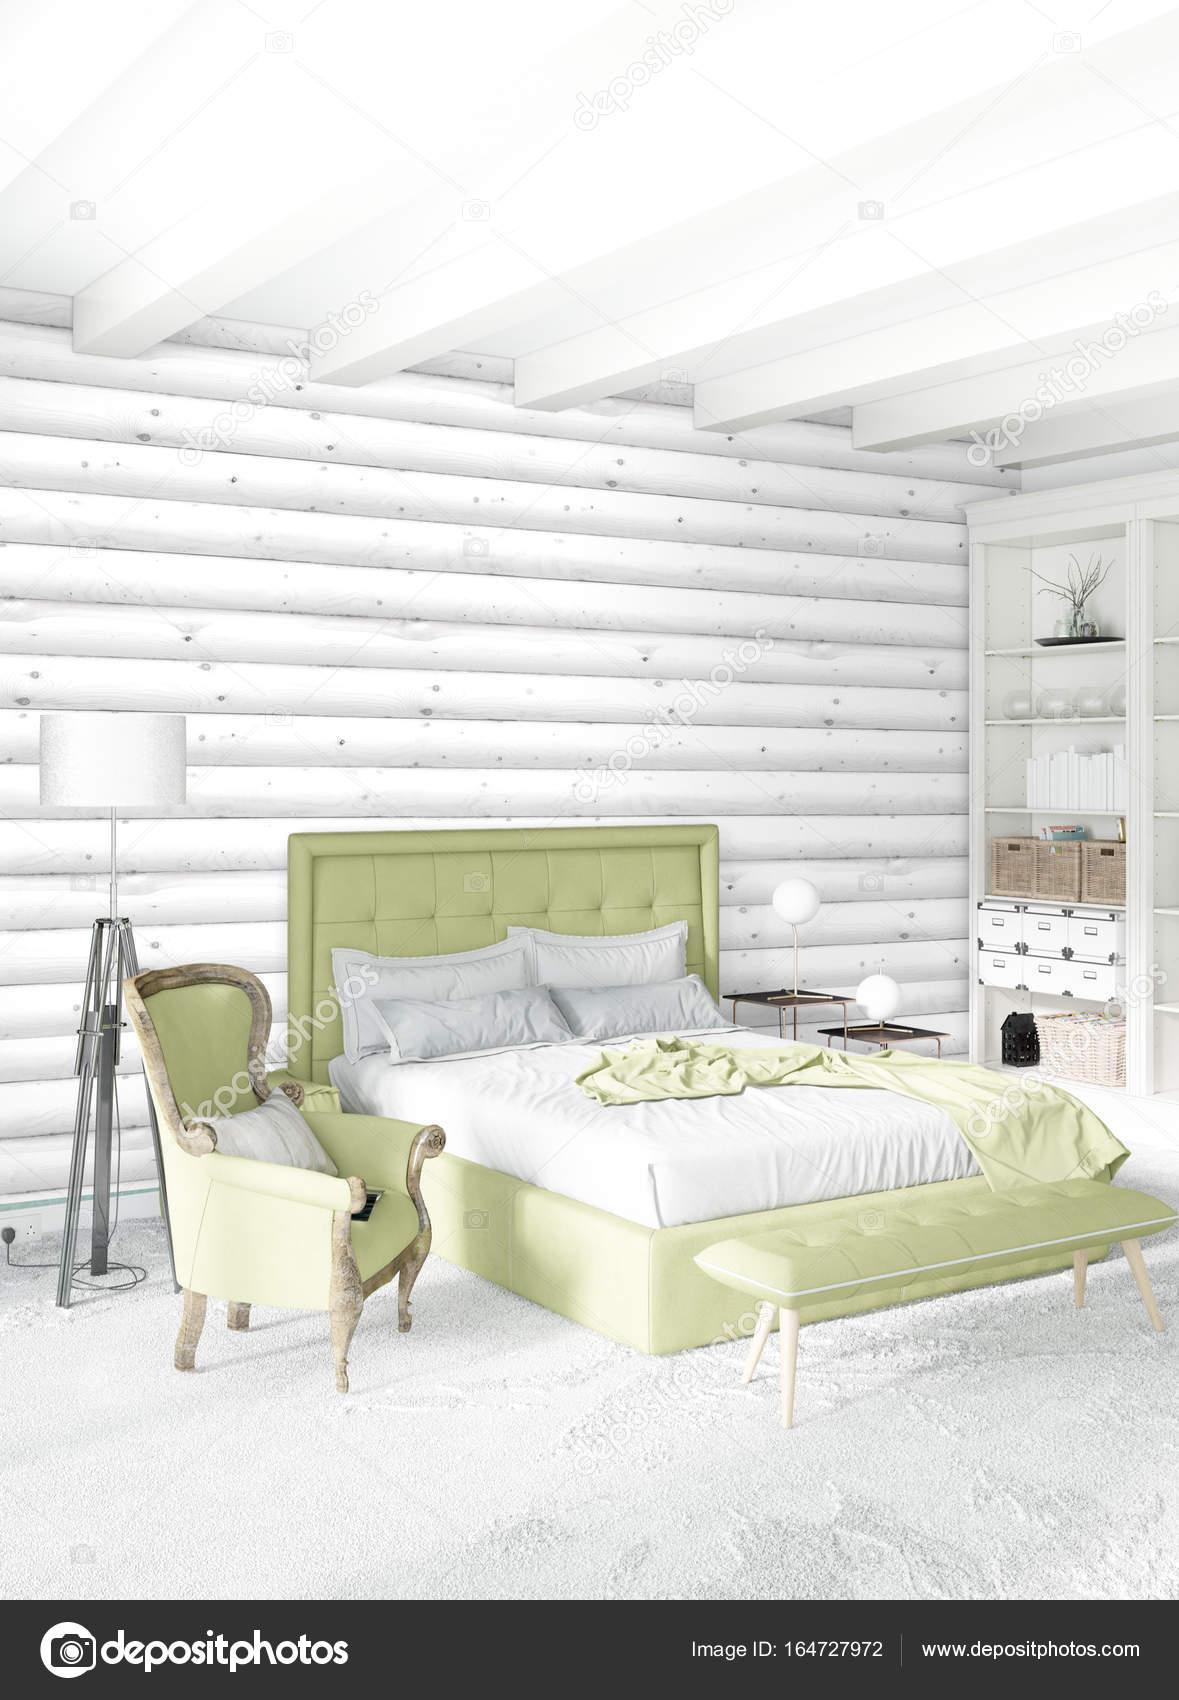 dsc products nero minimal dog sofia bed doggy lov